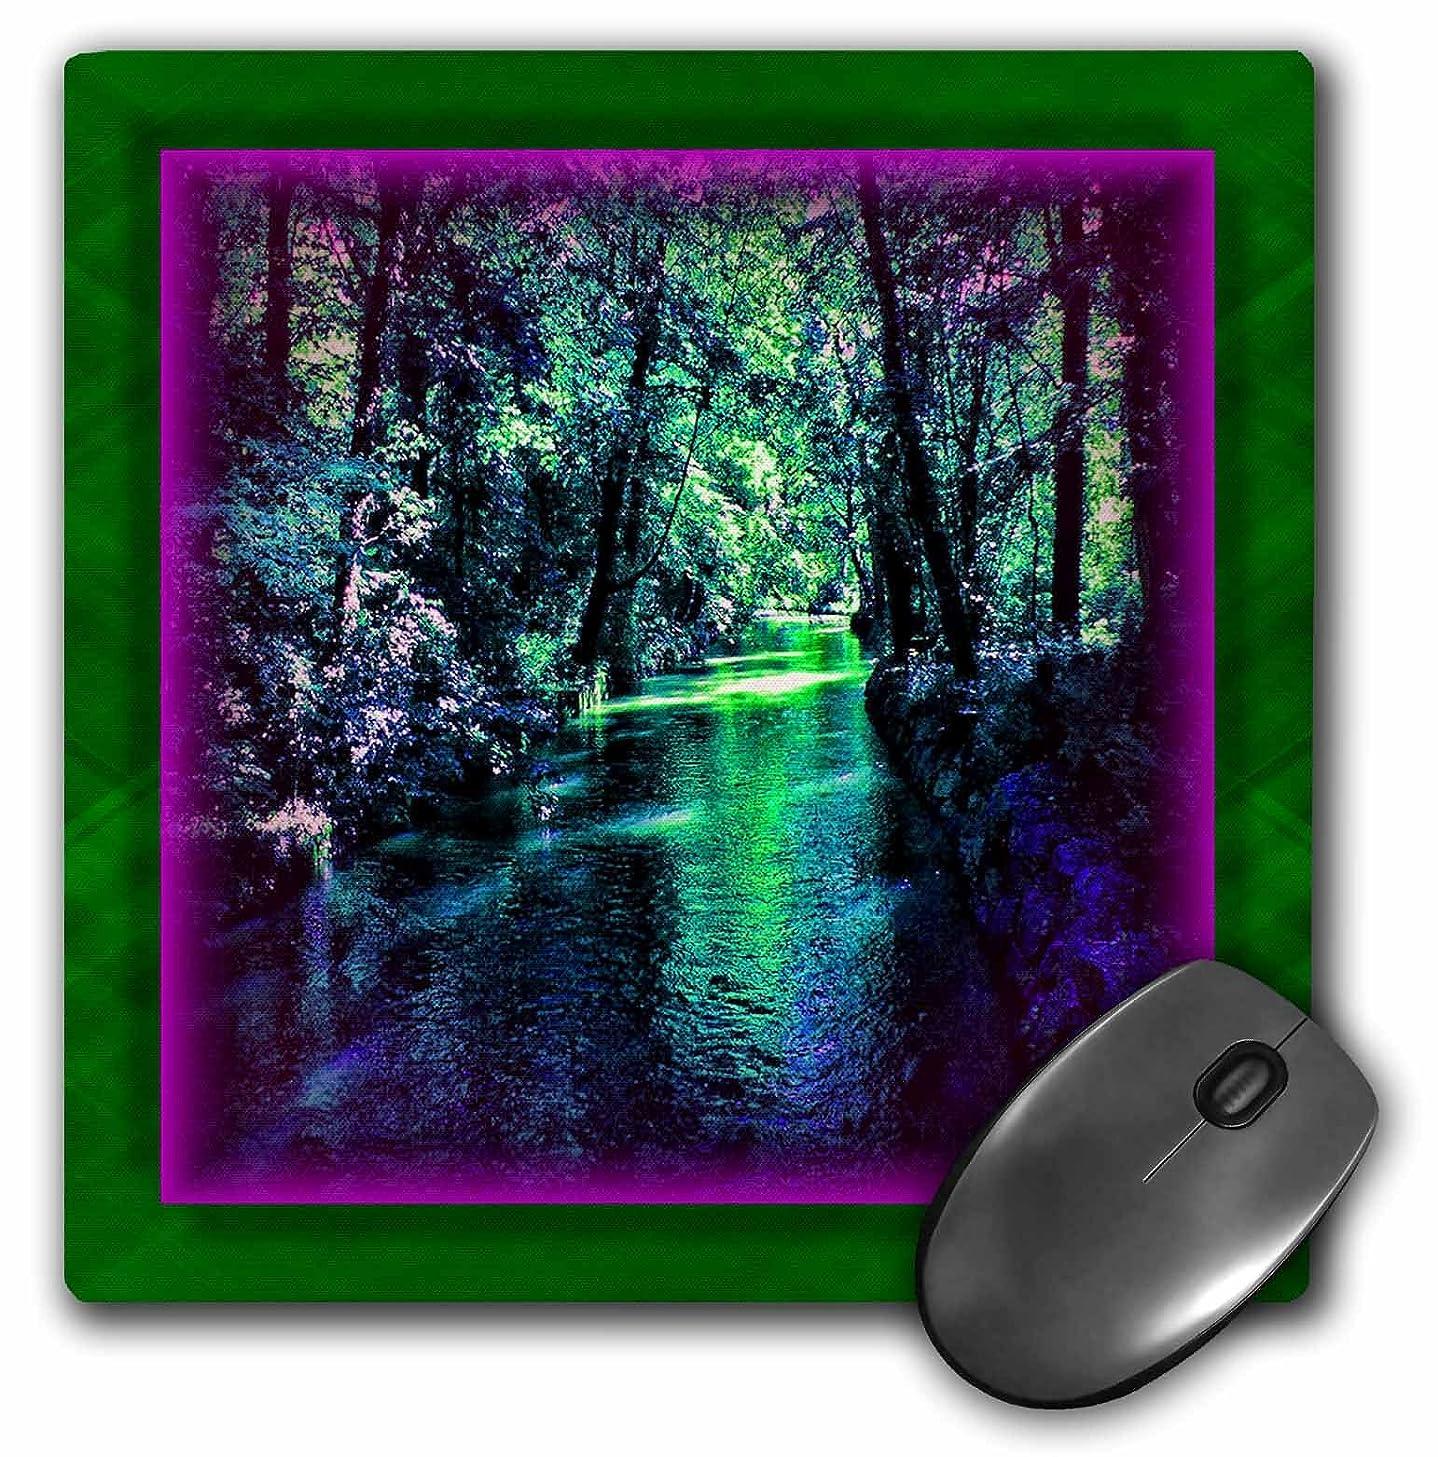 3dRose LLC 8 X 8 X 0.25 Inches Supreme Stream Mouse Pad (mp_24199_1)